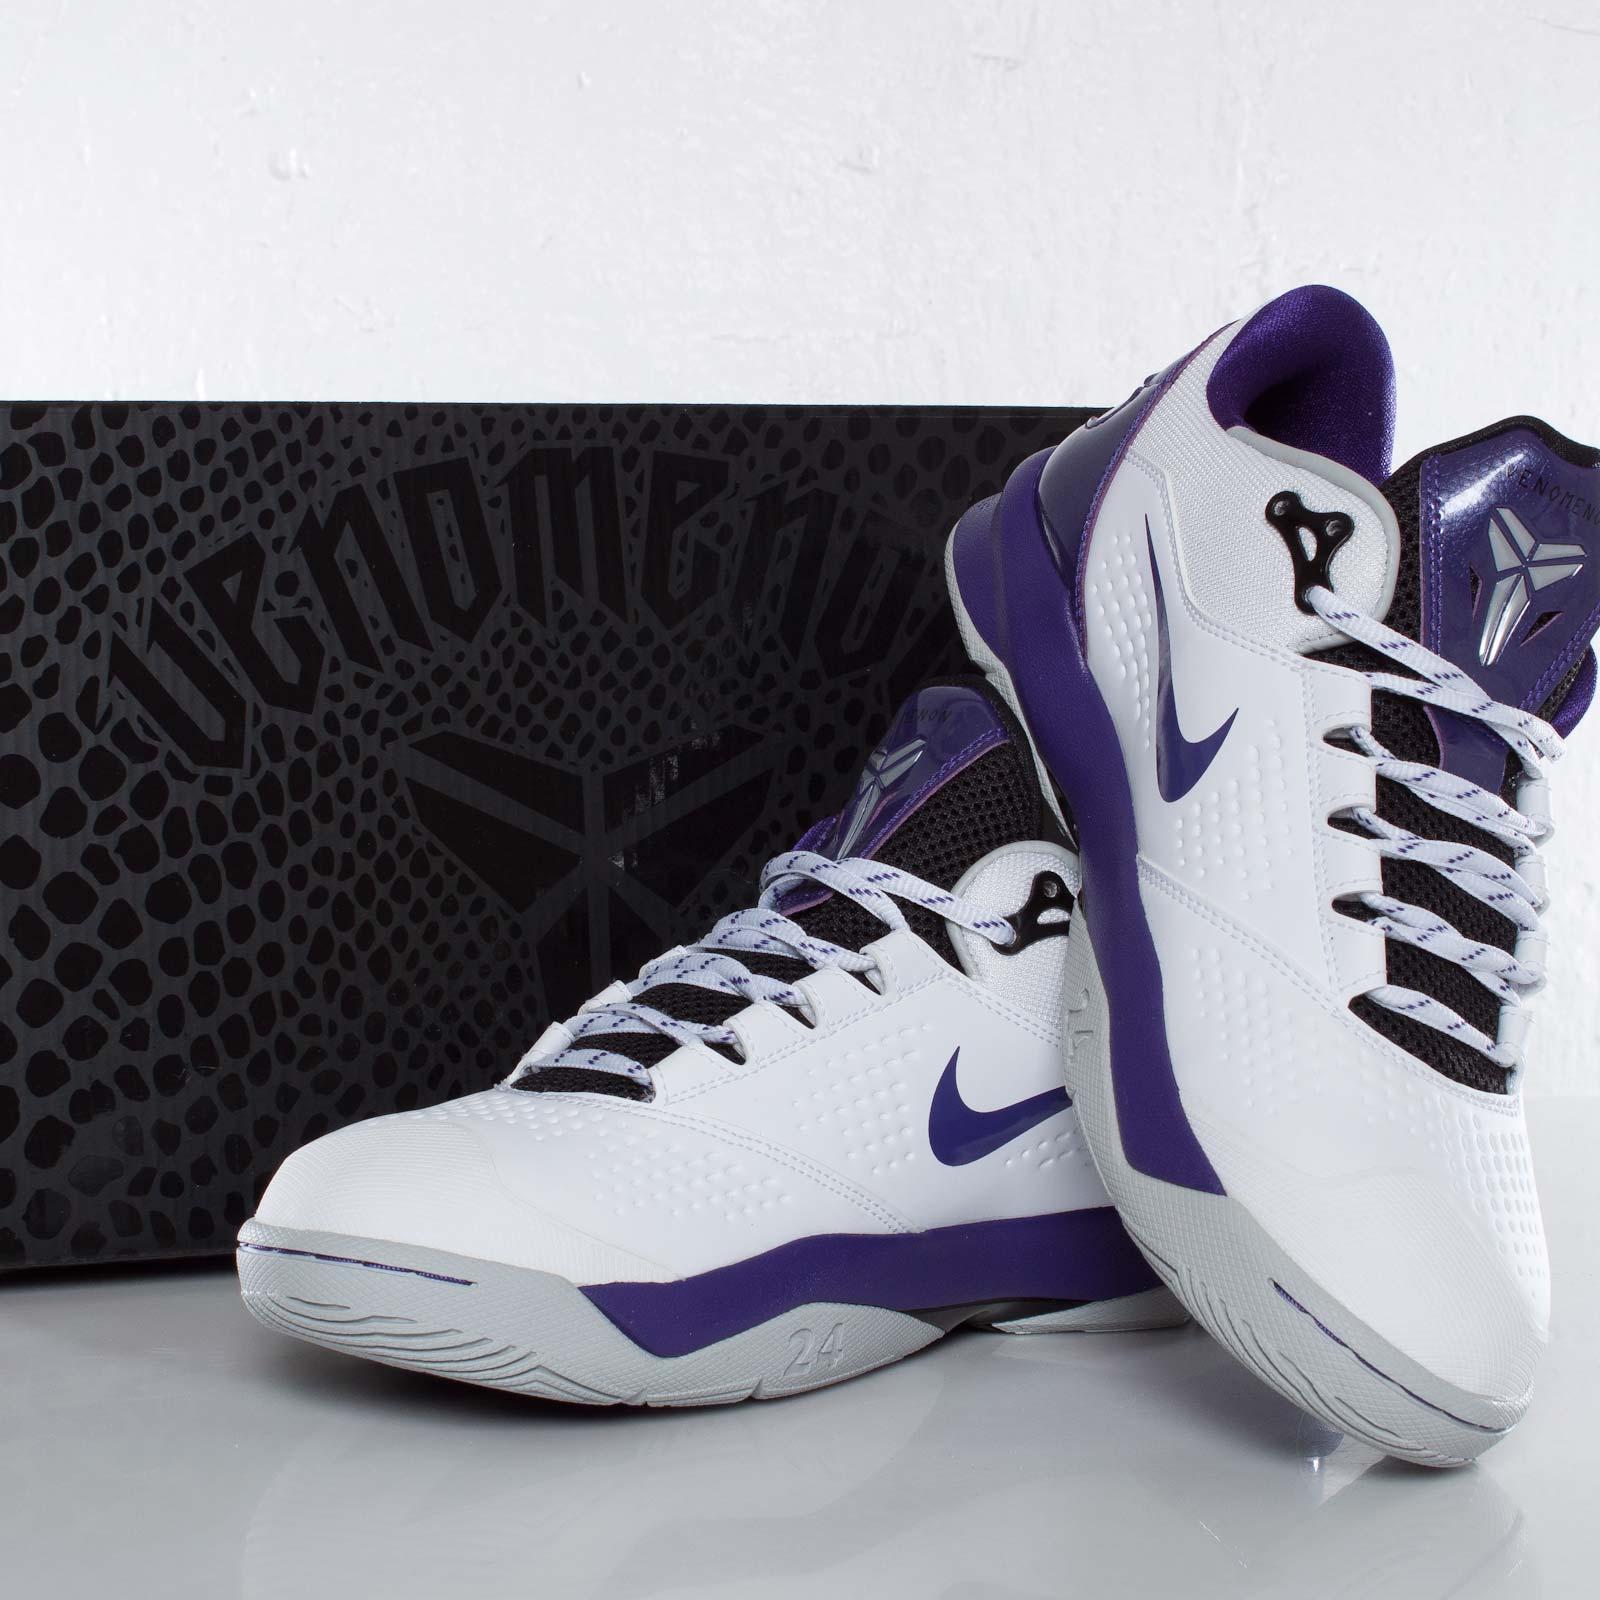 the best attitude 48069 2c2cf Nike Zoom Kobe Venomenon 3 - 555073-100 - Sneakersnstuff   sneakers ...